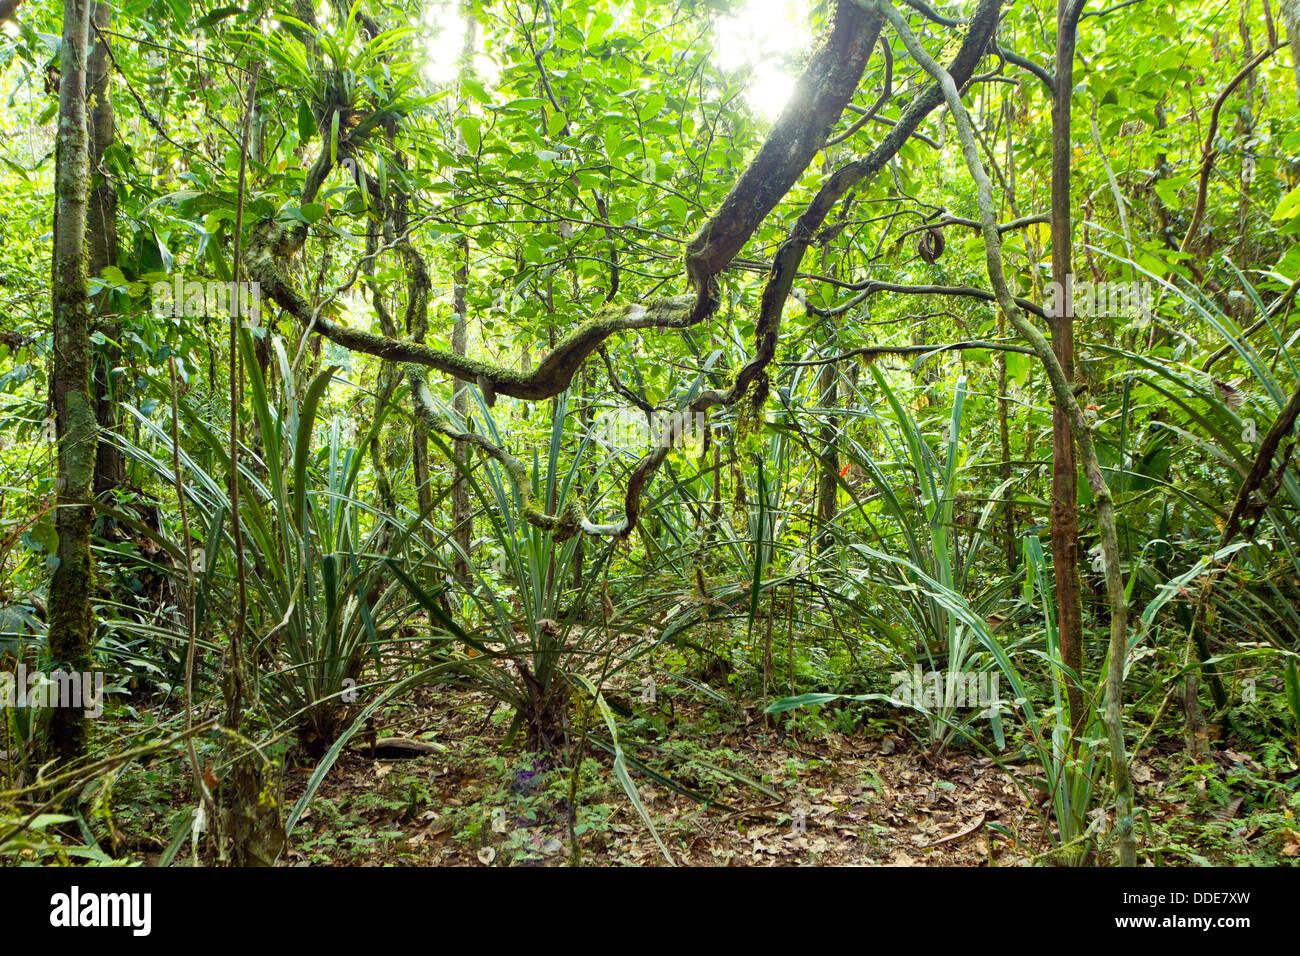 Lianas winding through the rainforest in the Ecuadorian Amazon - Stock Image